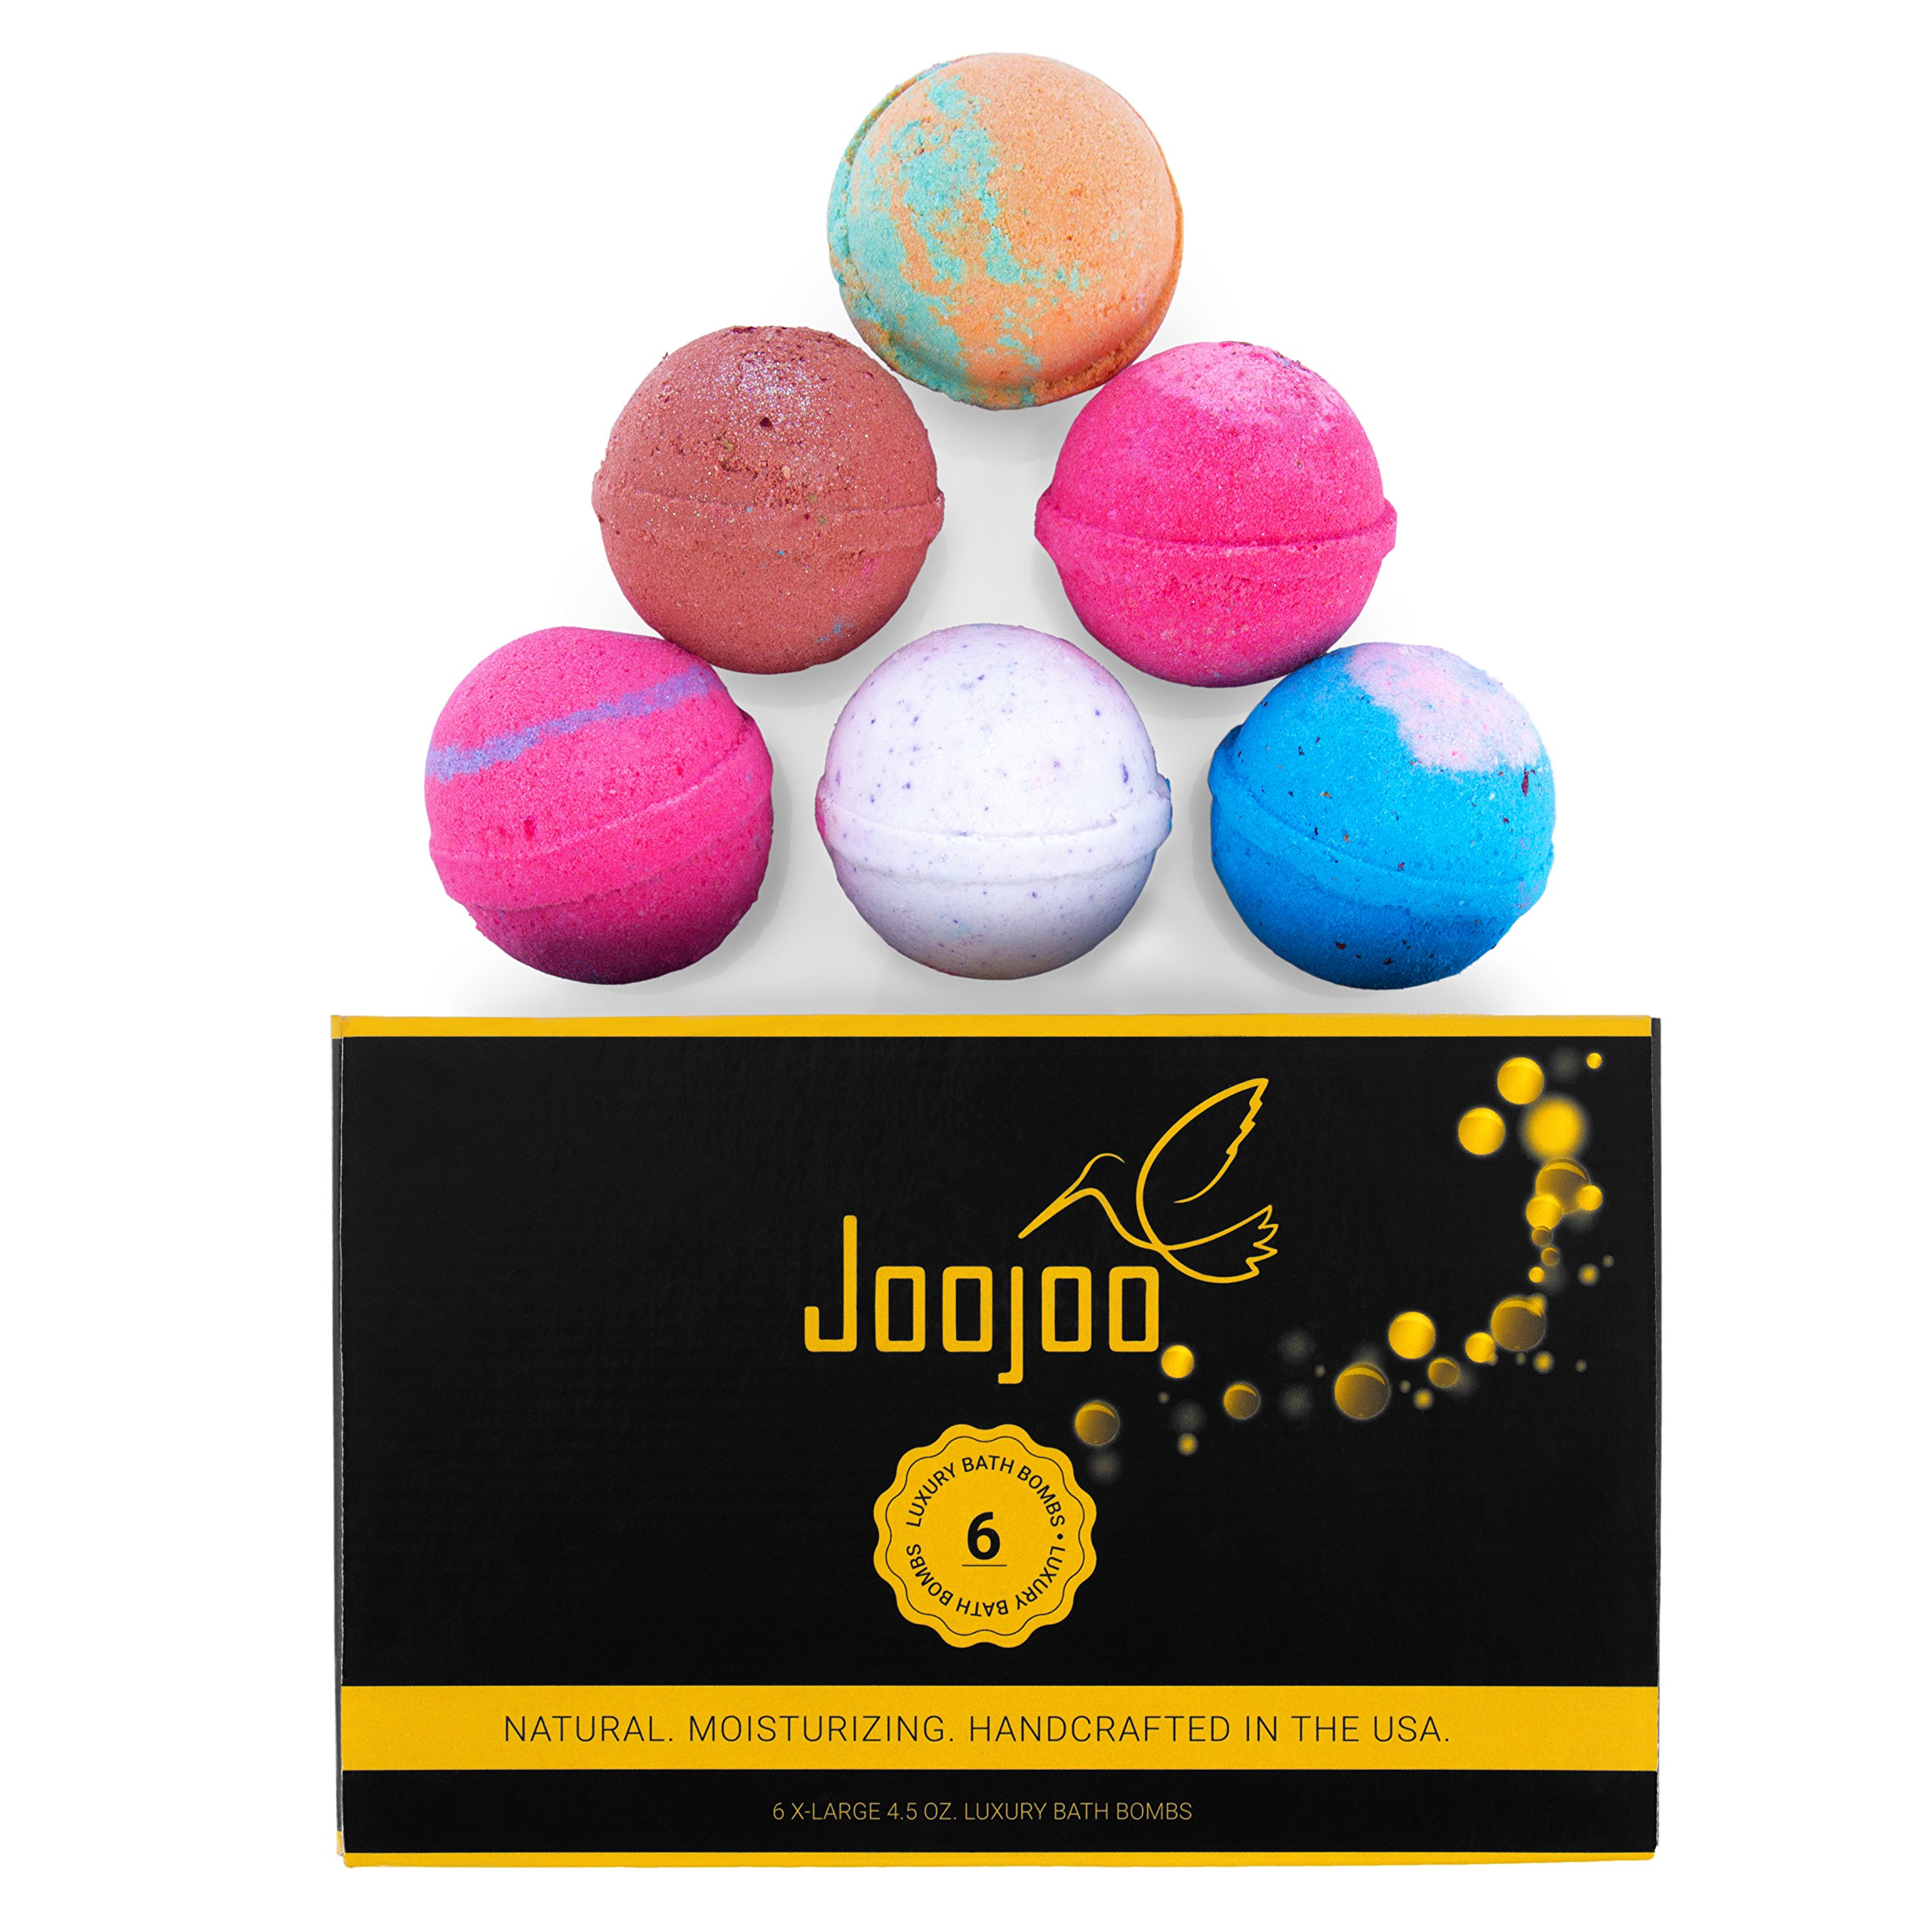 Joojoo Bath Bombs - SIX EXTRA LARGE 4.5 oz Ultra Lush Fizzy Bath Bombs Per Bath Bomb Kit-- Handmade In USA - Lavender, Moonlight & Roses, Cucumber Melon, Crazy Love, Petal Dance, Kiss Me